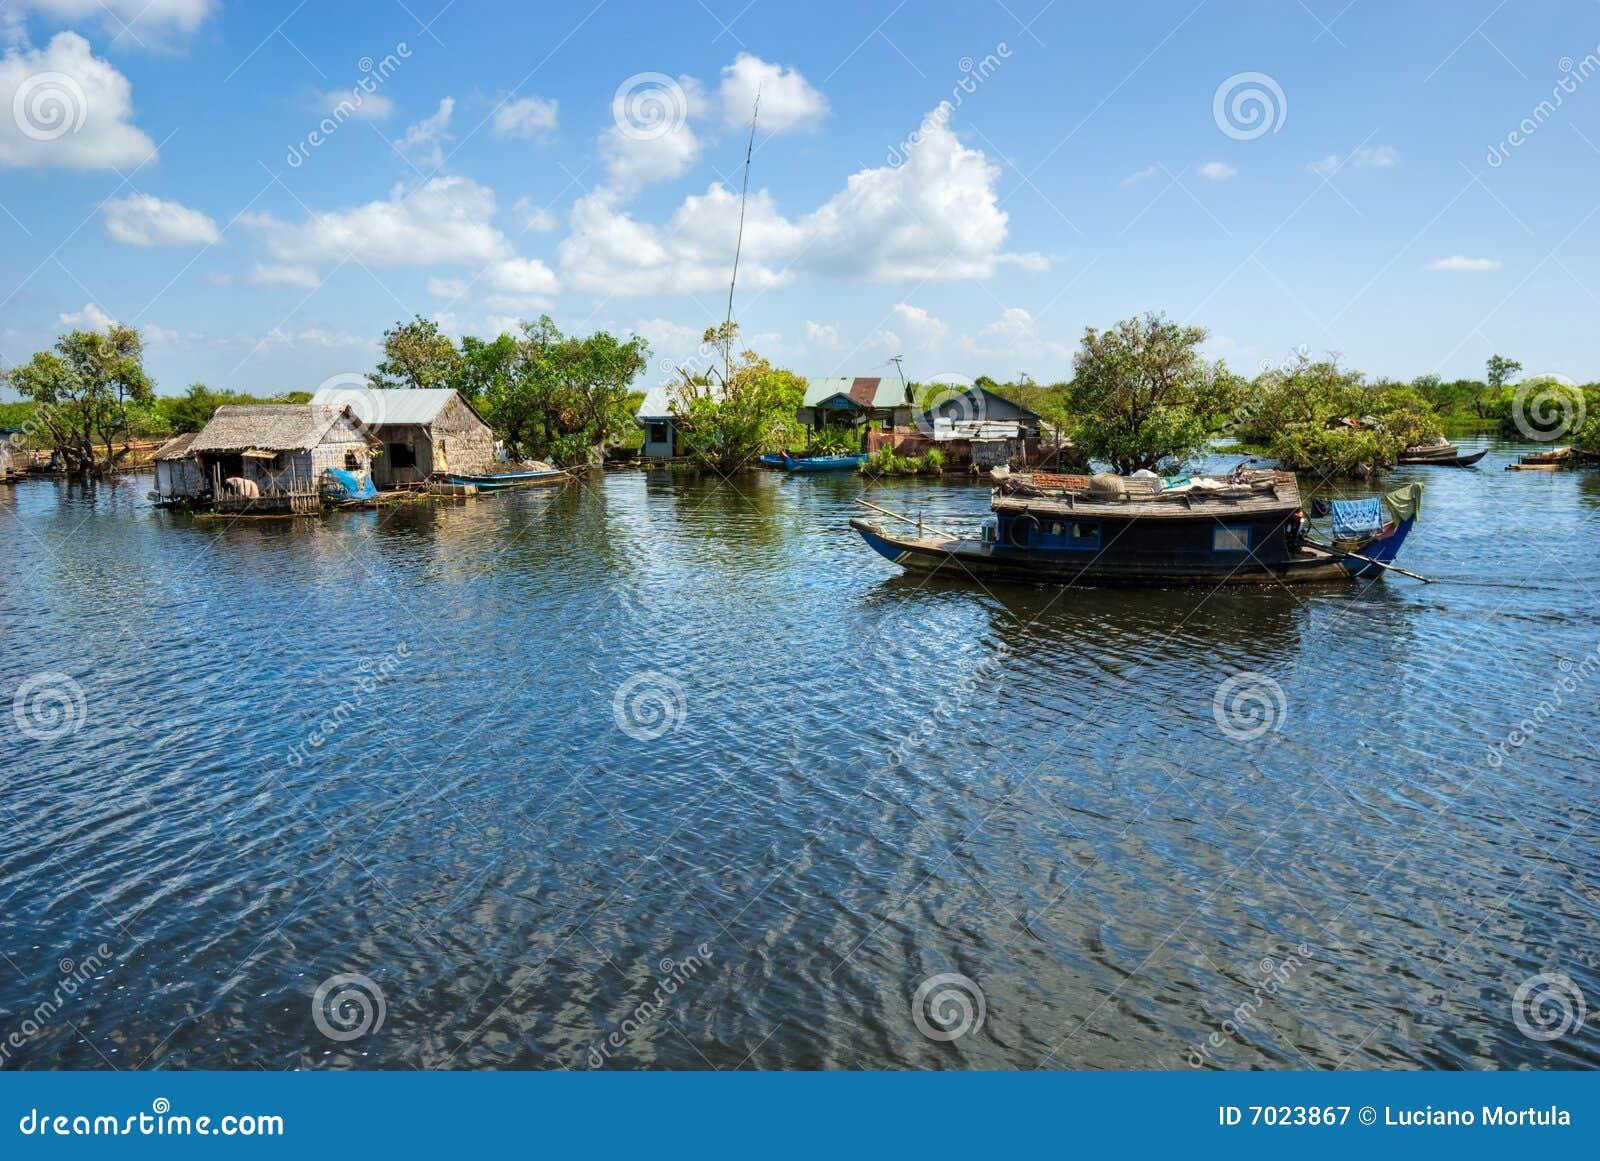 Het meer van het Sap van Tonle, Kambodja.